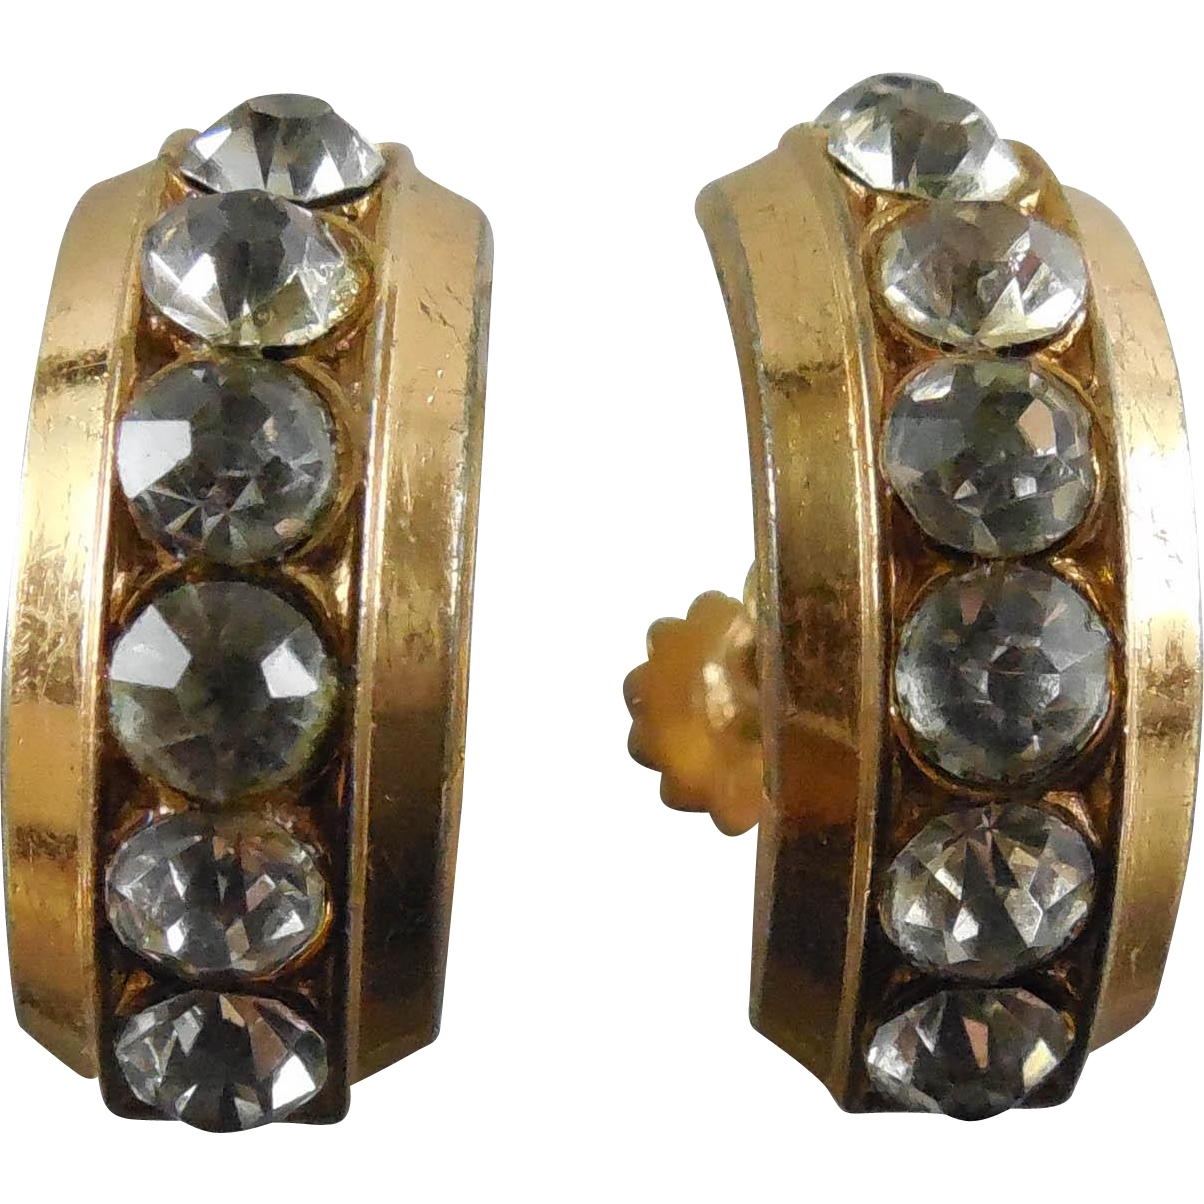 Older Vintage Signed Coro Rhinestone Earrings - Circa 1940s Screw On Sparklers